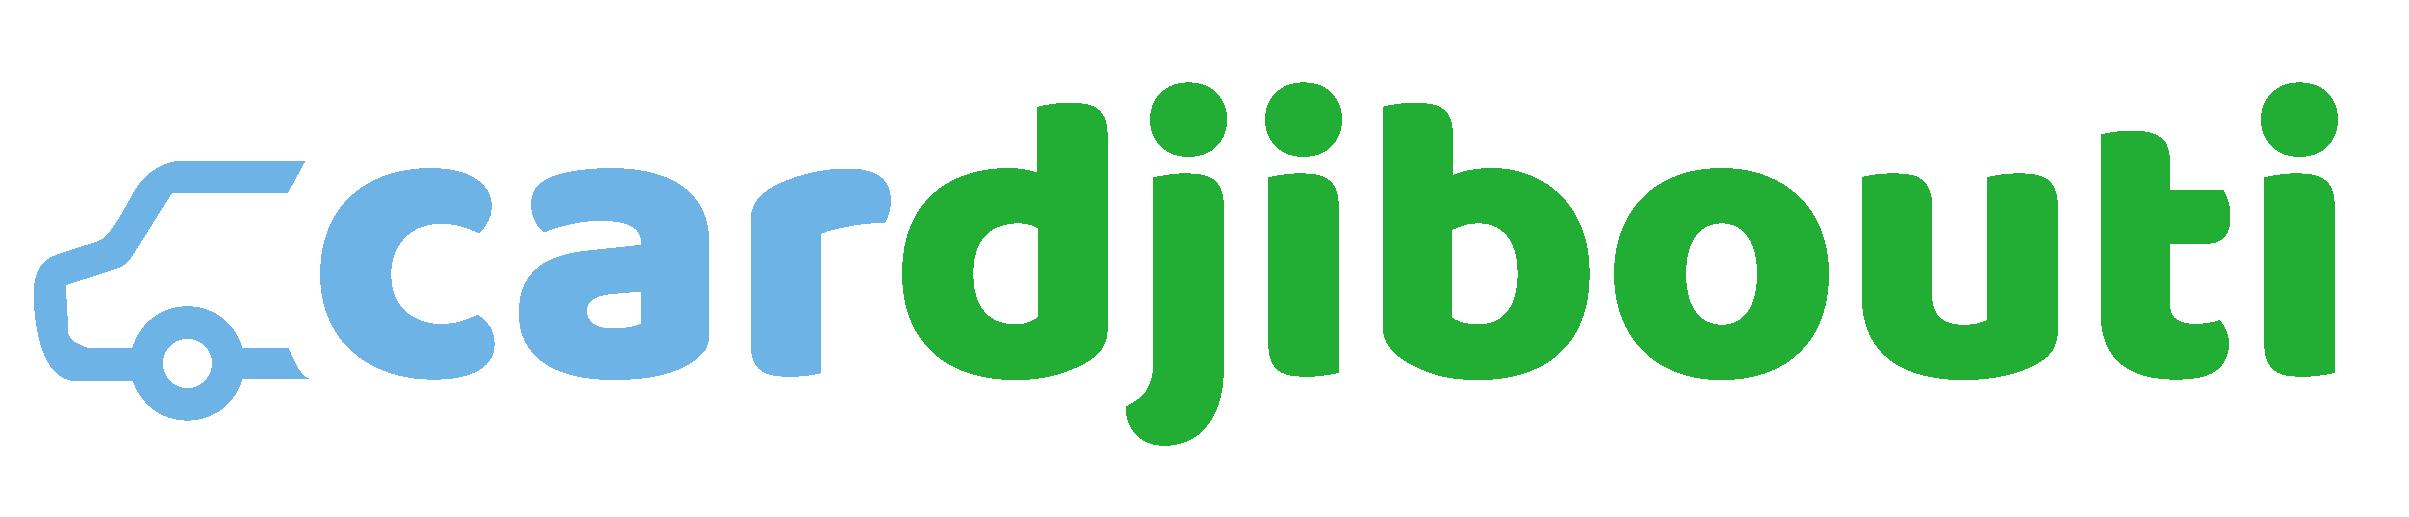 Cardjibouti logo